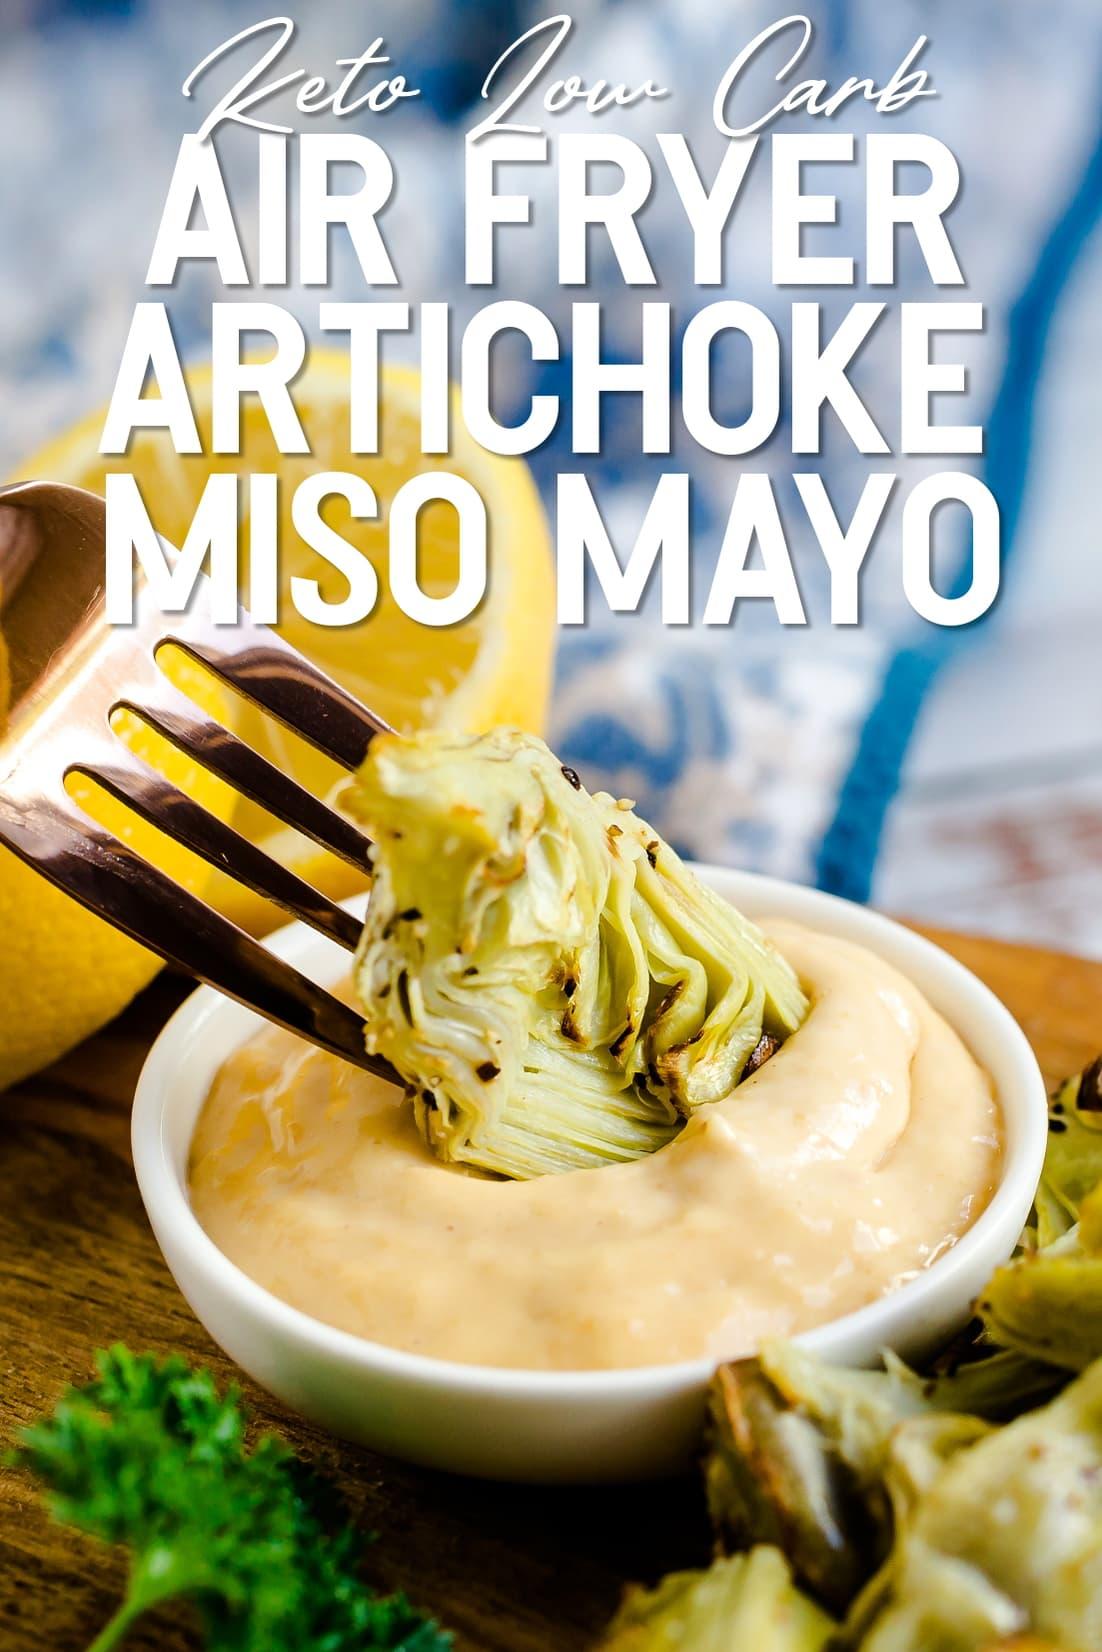 Air Fryer Artichoke being dipped in garlic miso mayo sauce